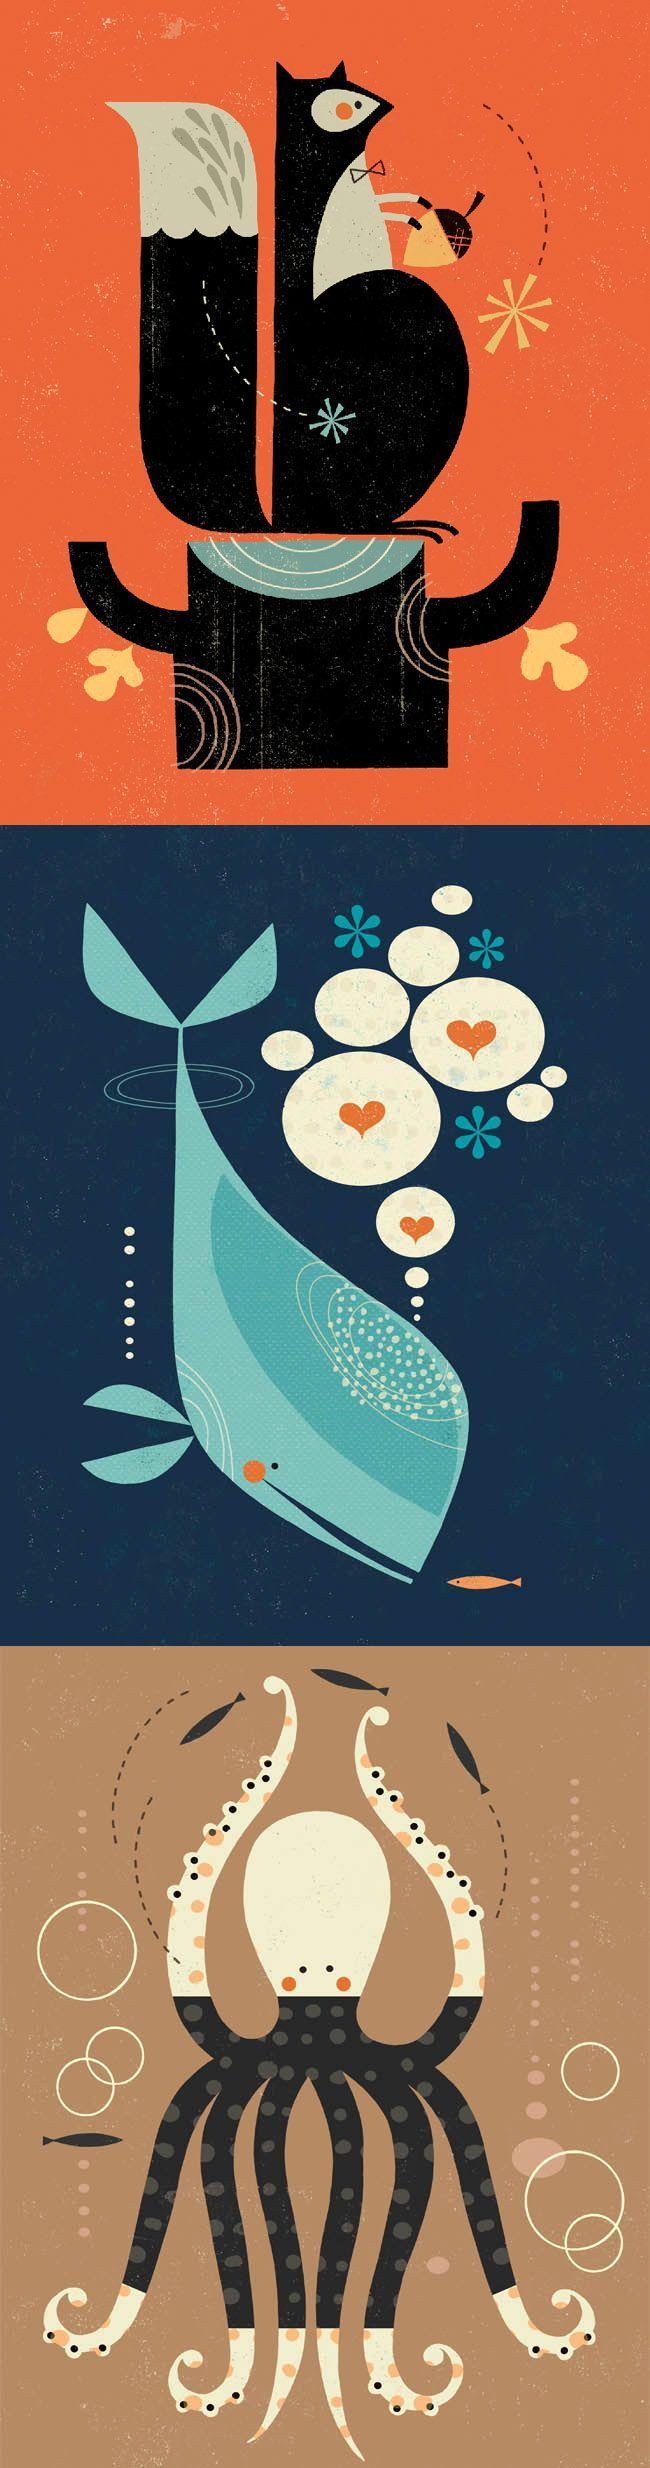 296 best Zoo Design images on Pinterest | Graph design ...